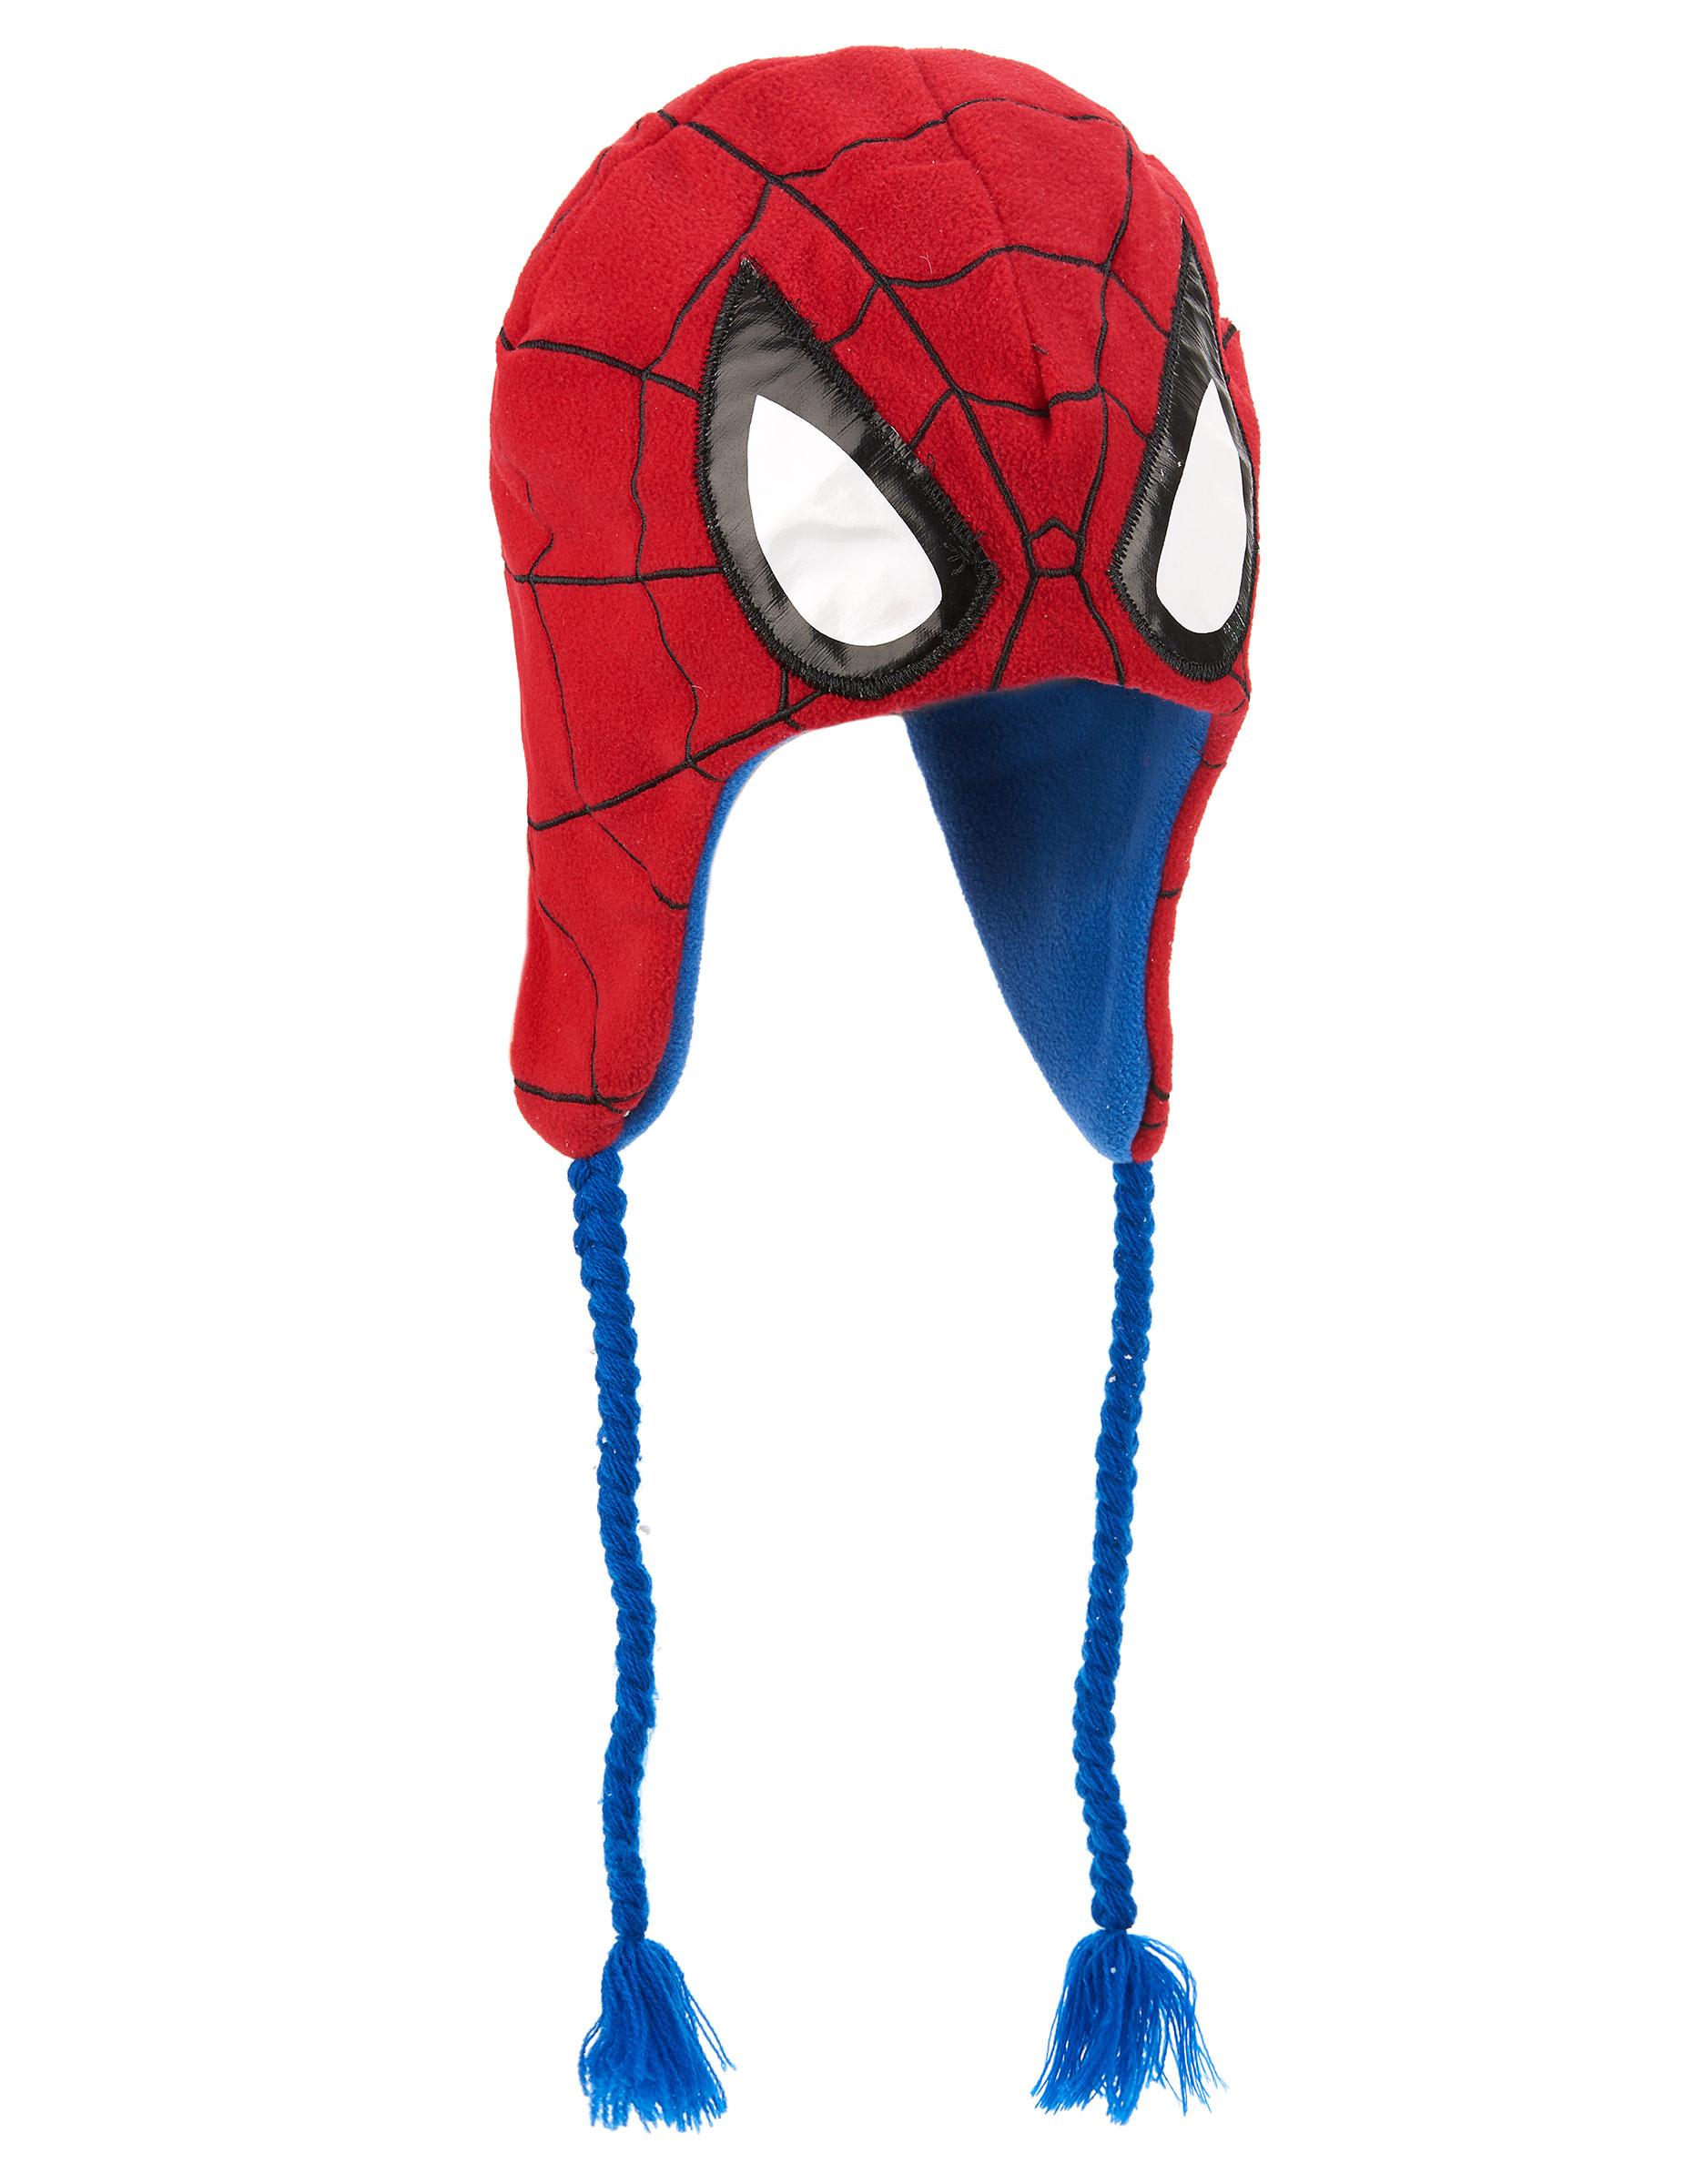 spiderman m tze f r erwachsene h te und g nstige faschingskost me vegaoo. Black Bedroom Furniture Sets. Home Design Ideas